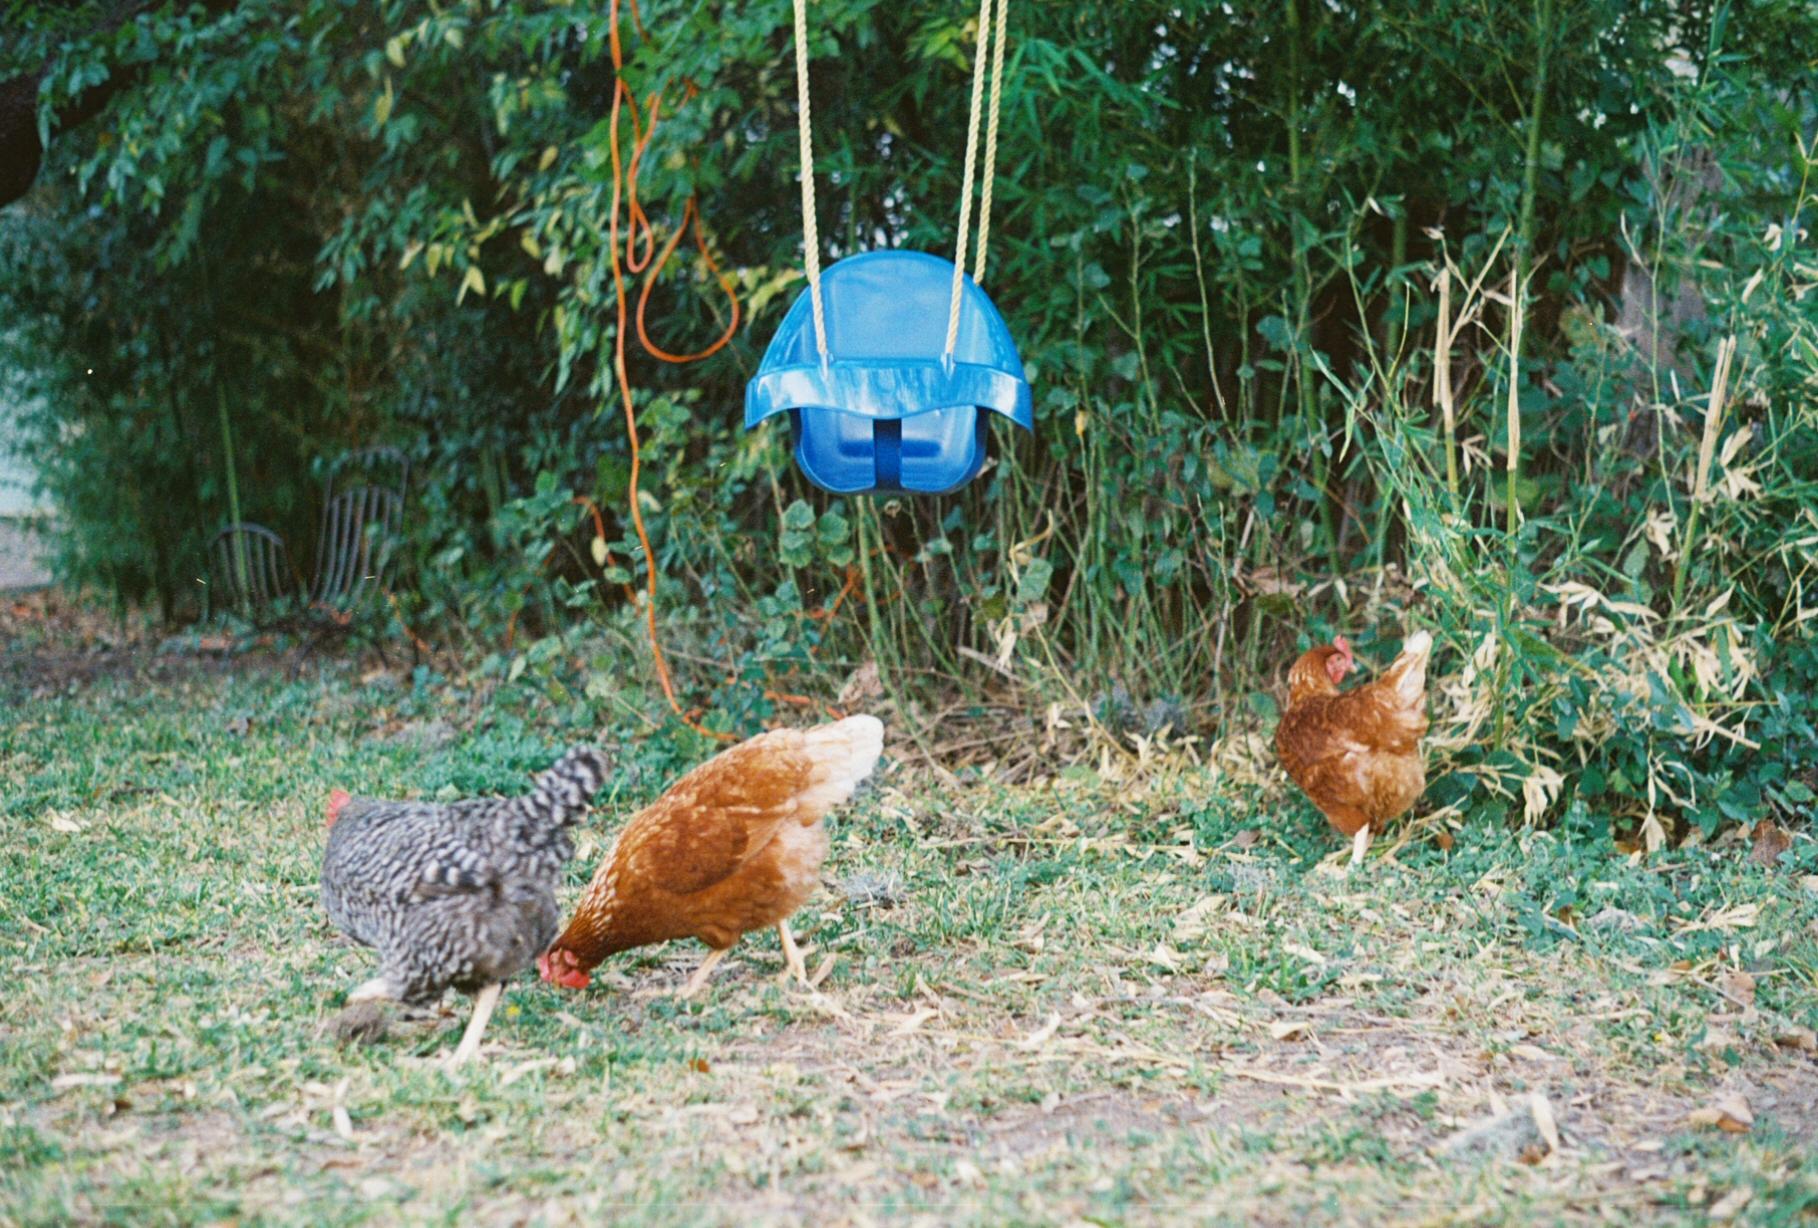 Chickens of Austin, TX